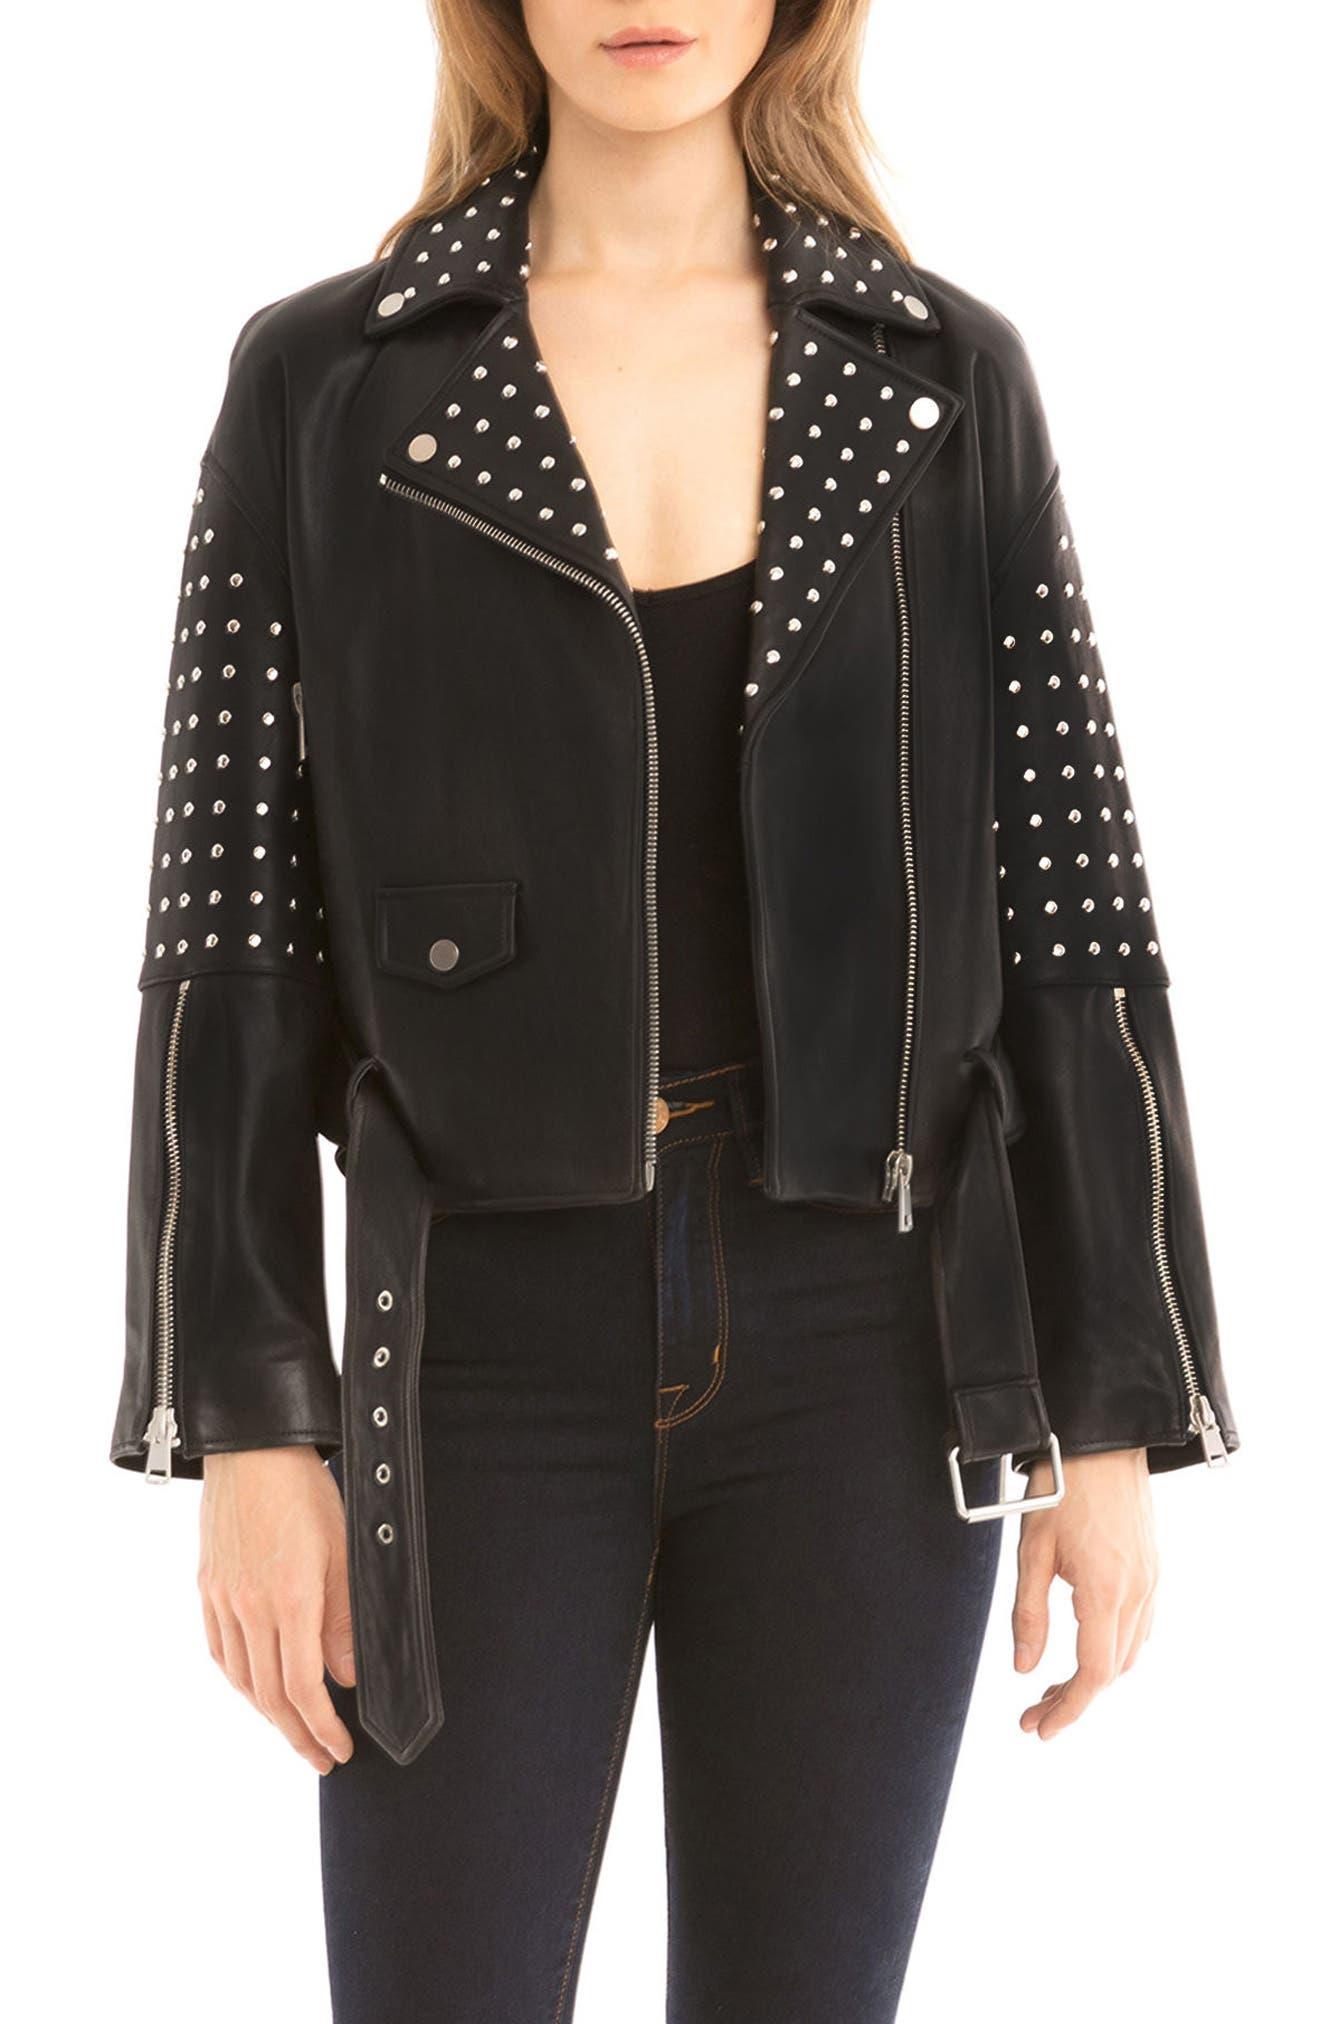 Bagatelle Studded Leather Jacket,                             Main thumbnail 1, color,                             001